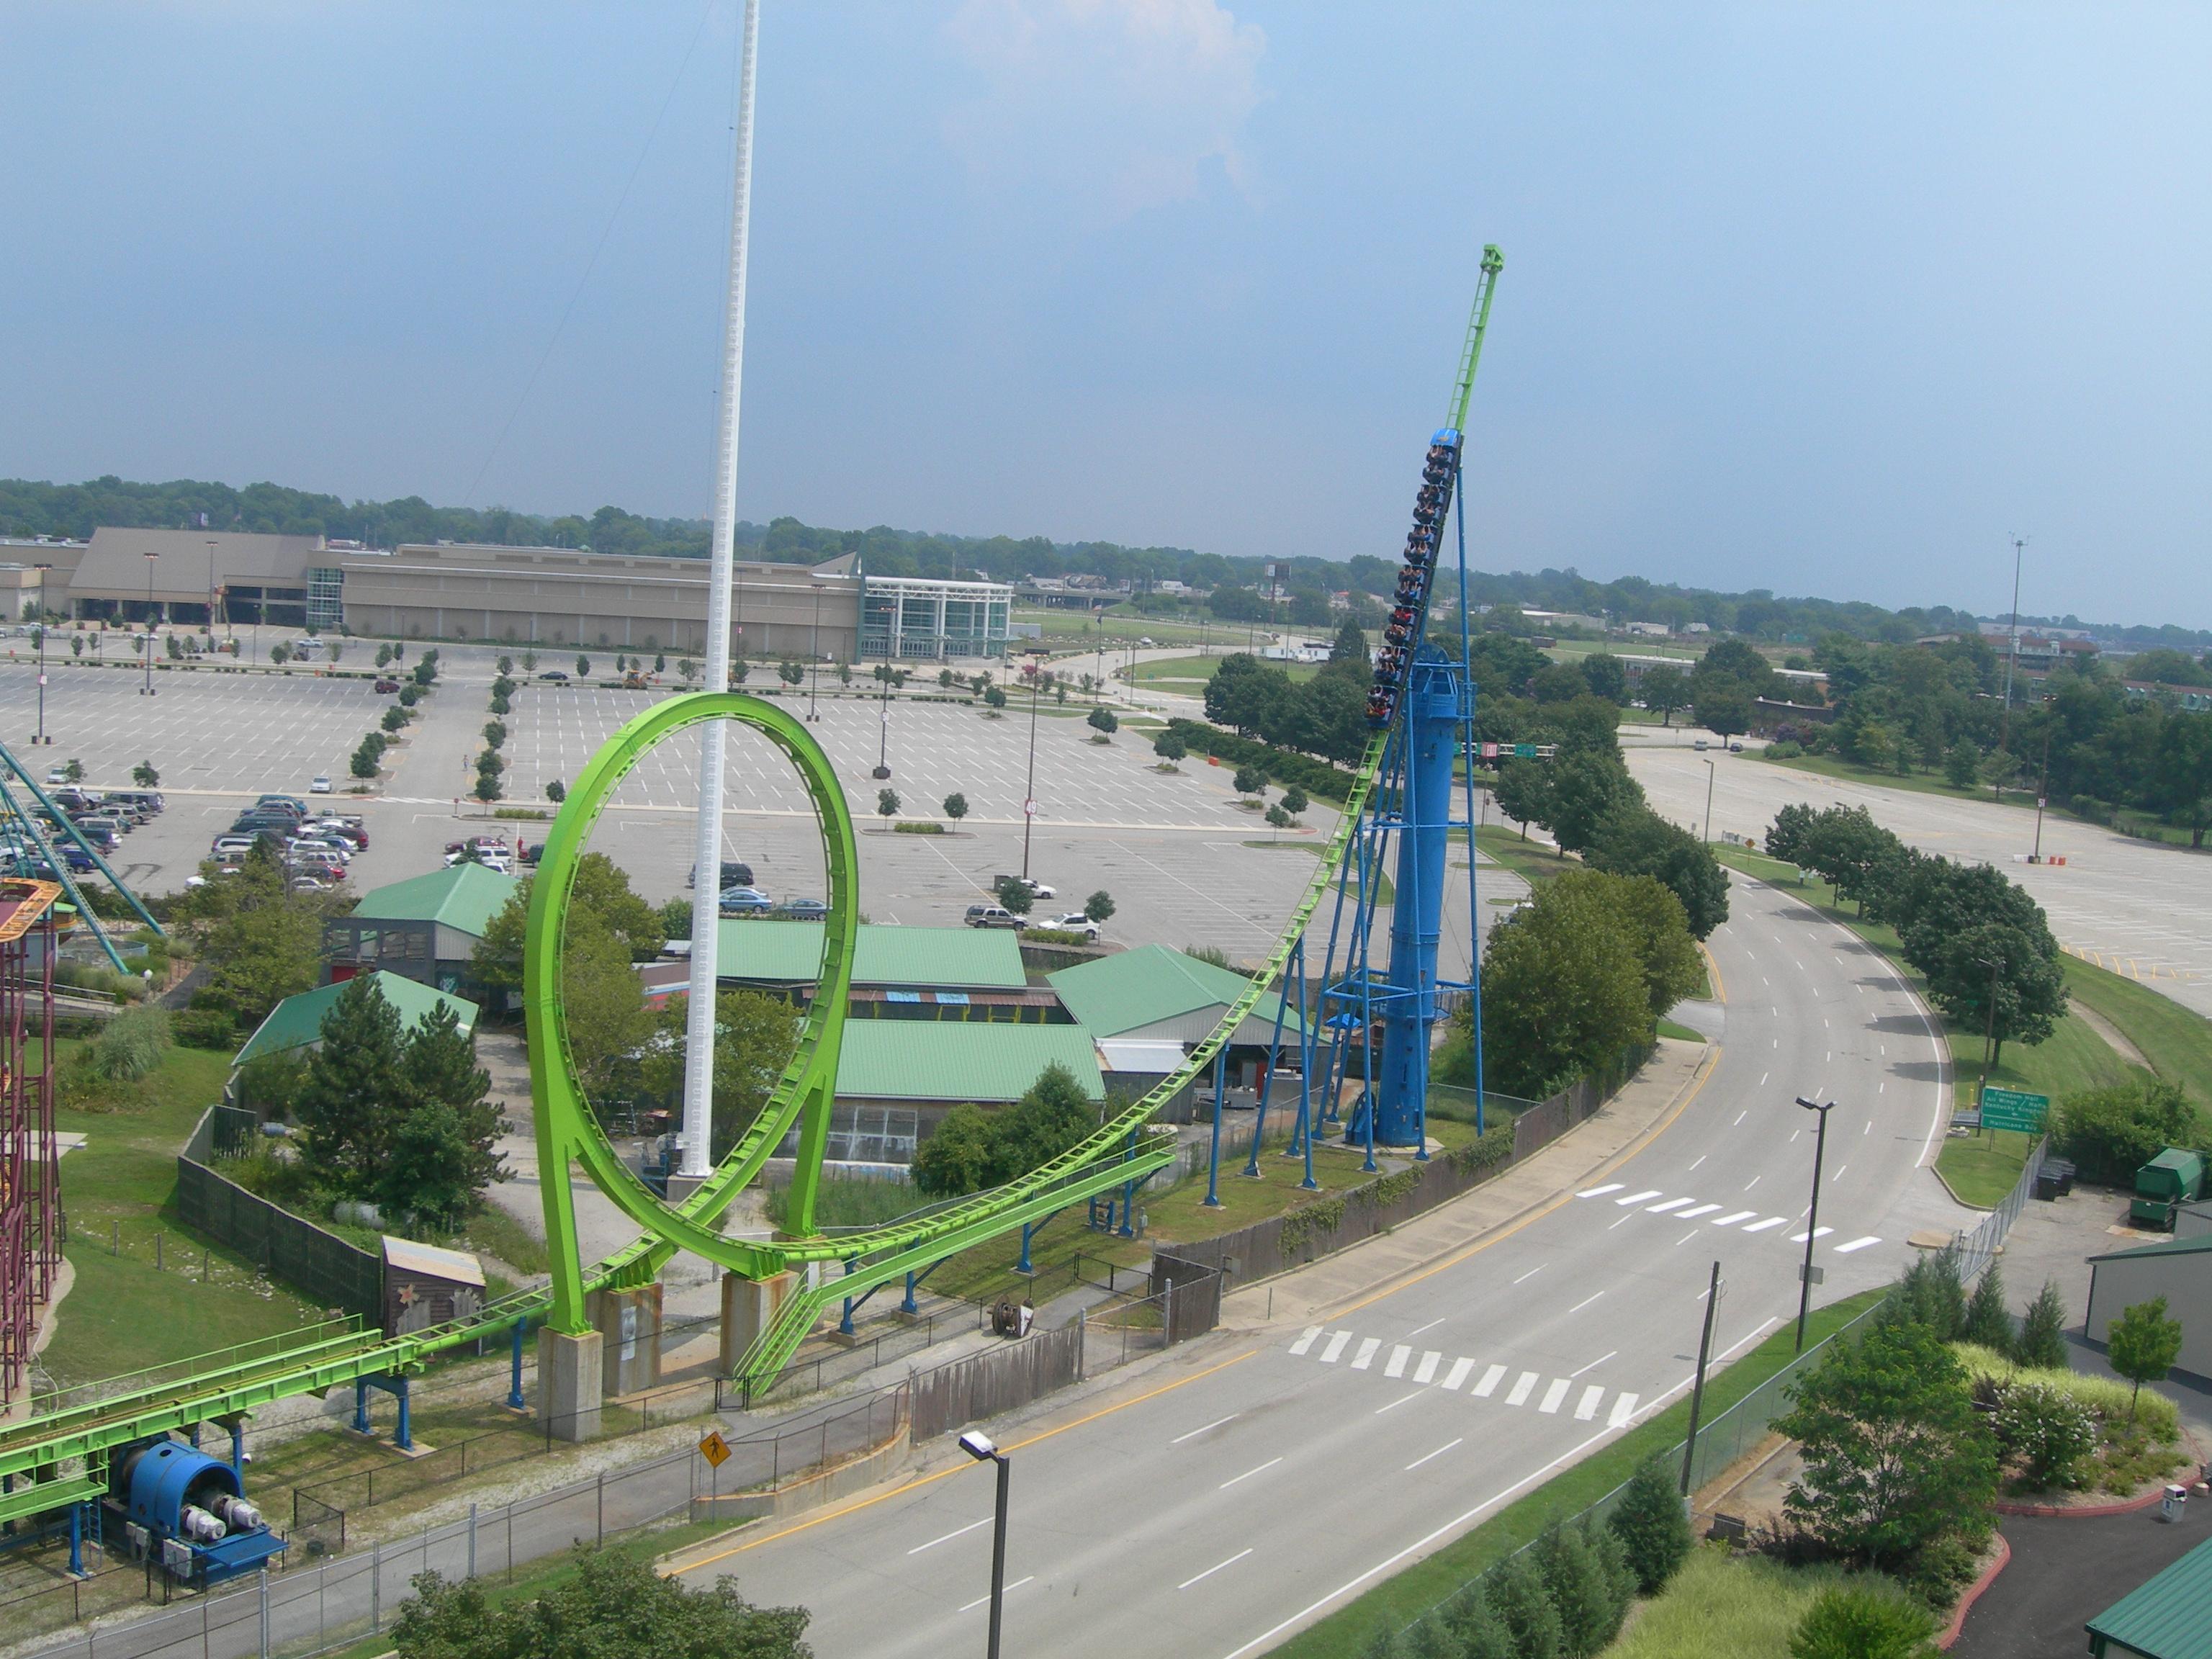 Long loops enamelled fir green shuttle